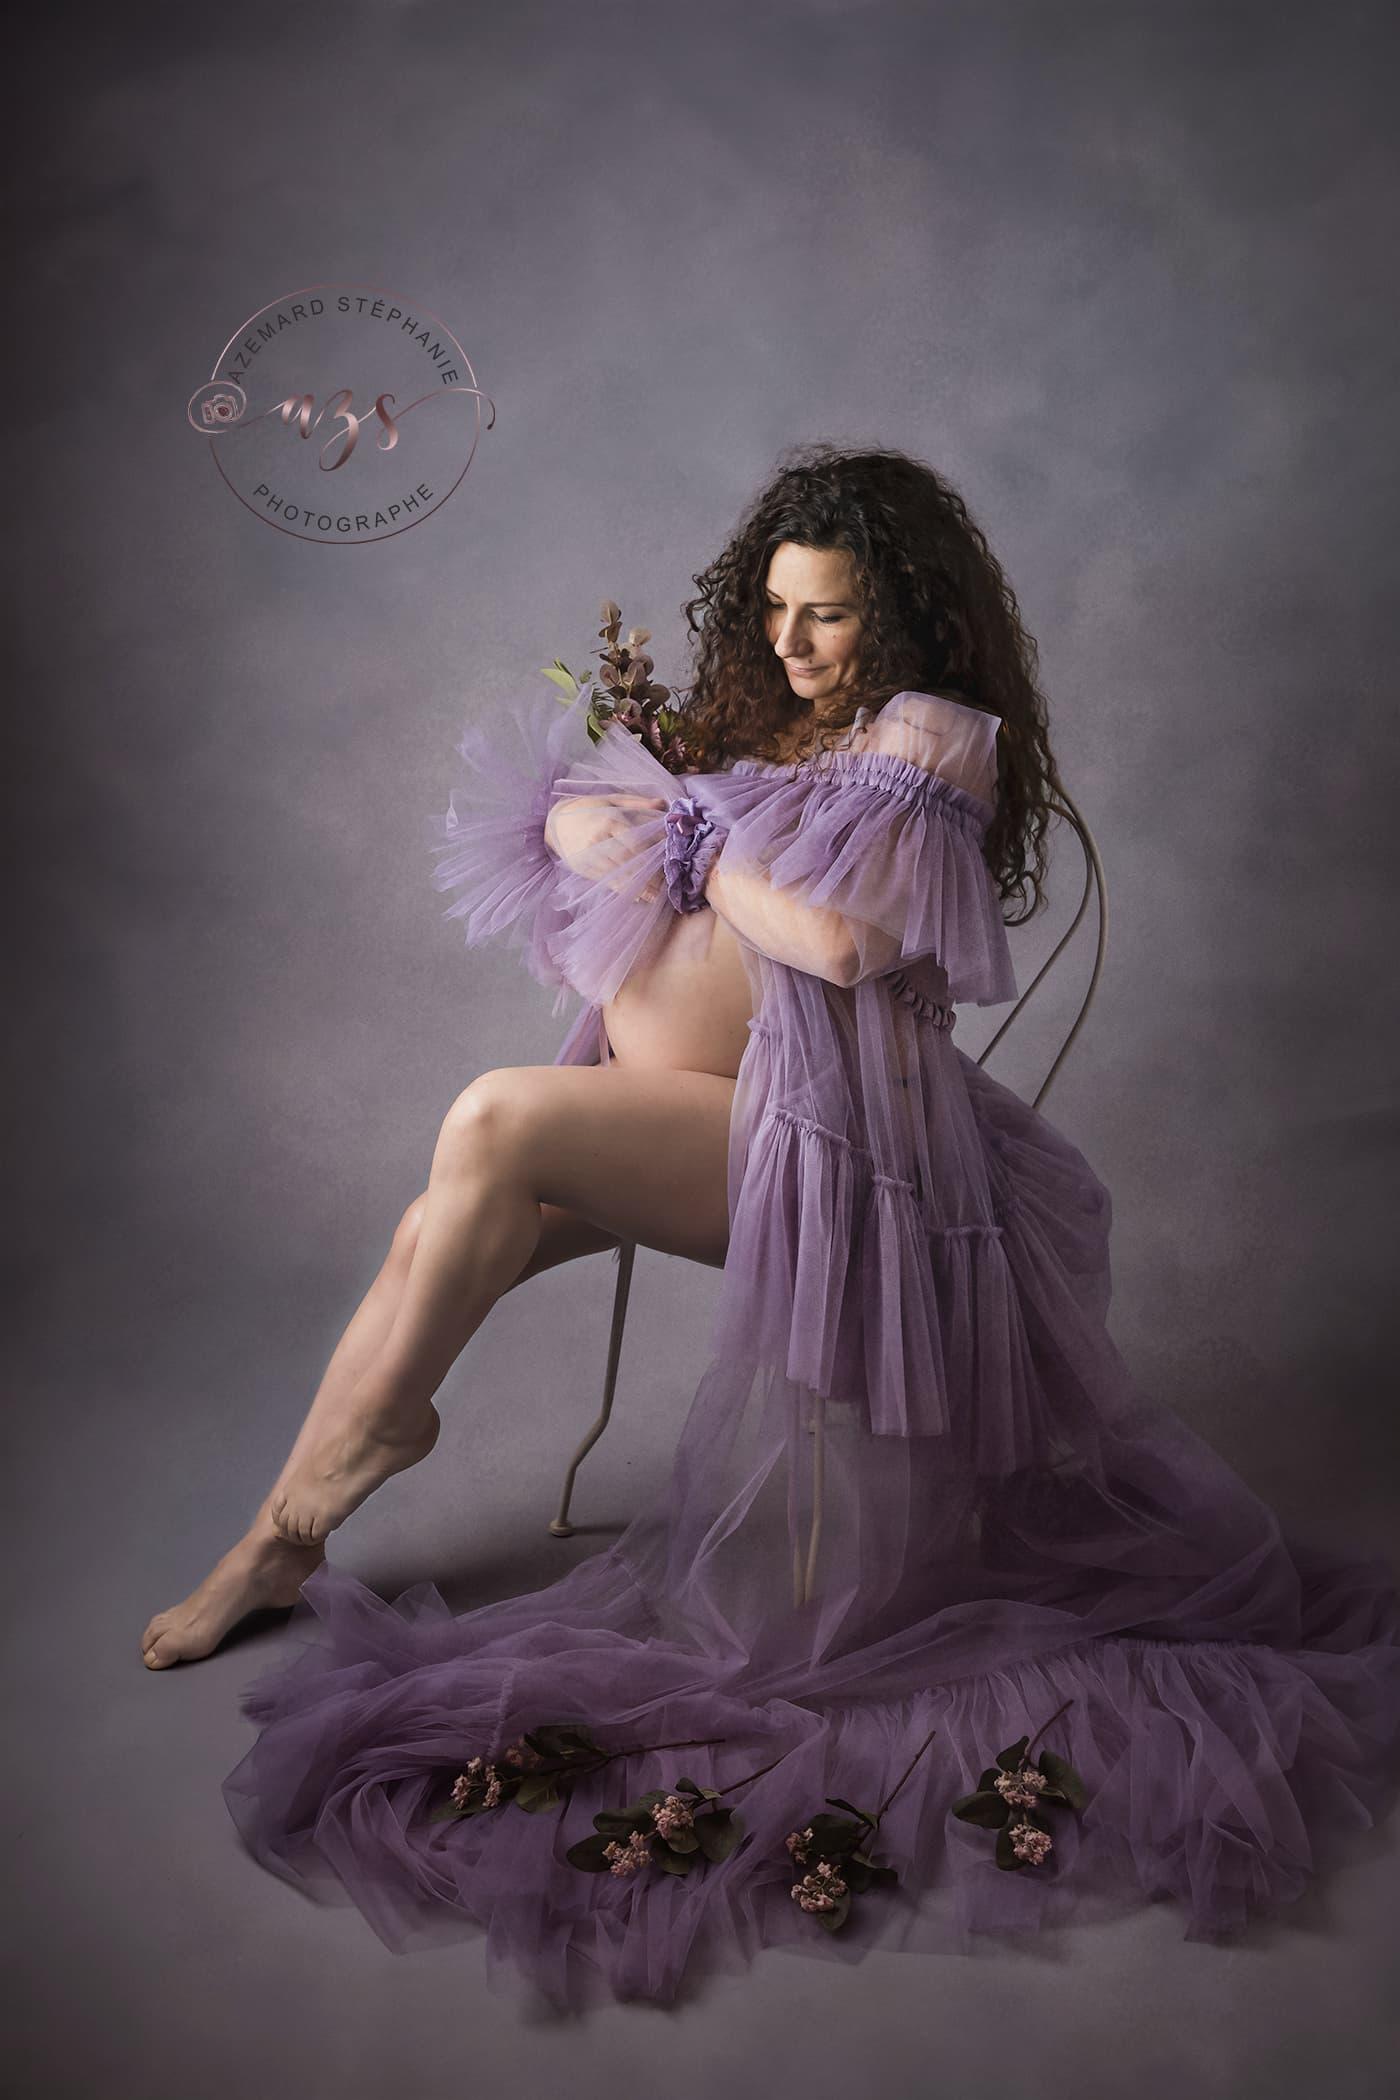 Photo de grossesse avec robe katharina tulle réalisé par Azemard Stéphanie photographe